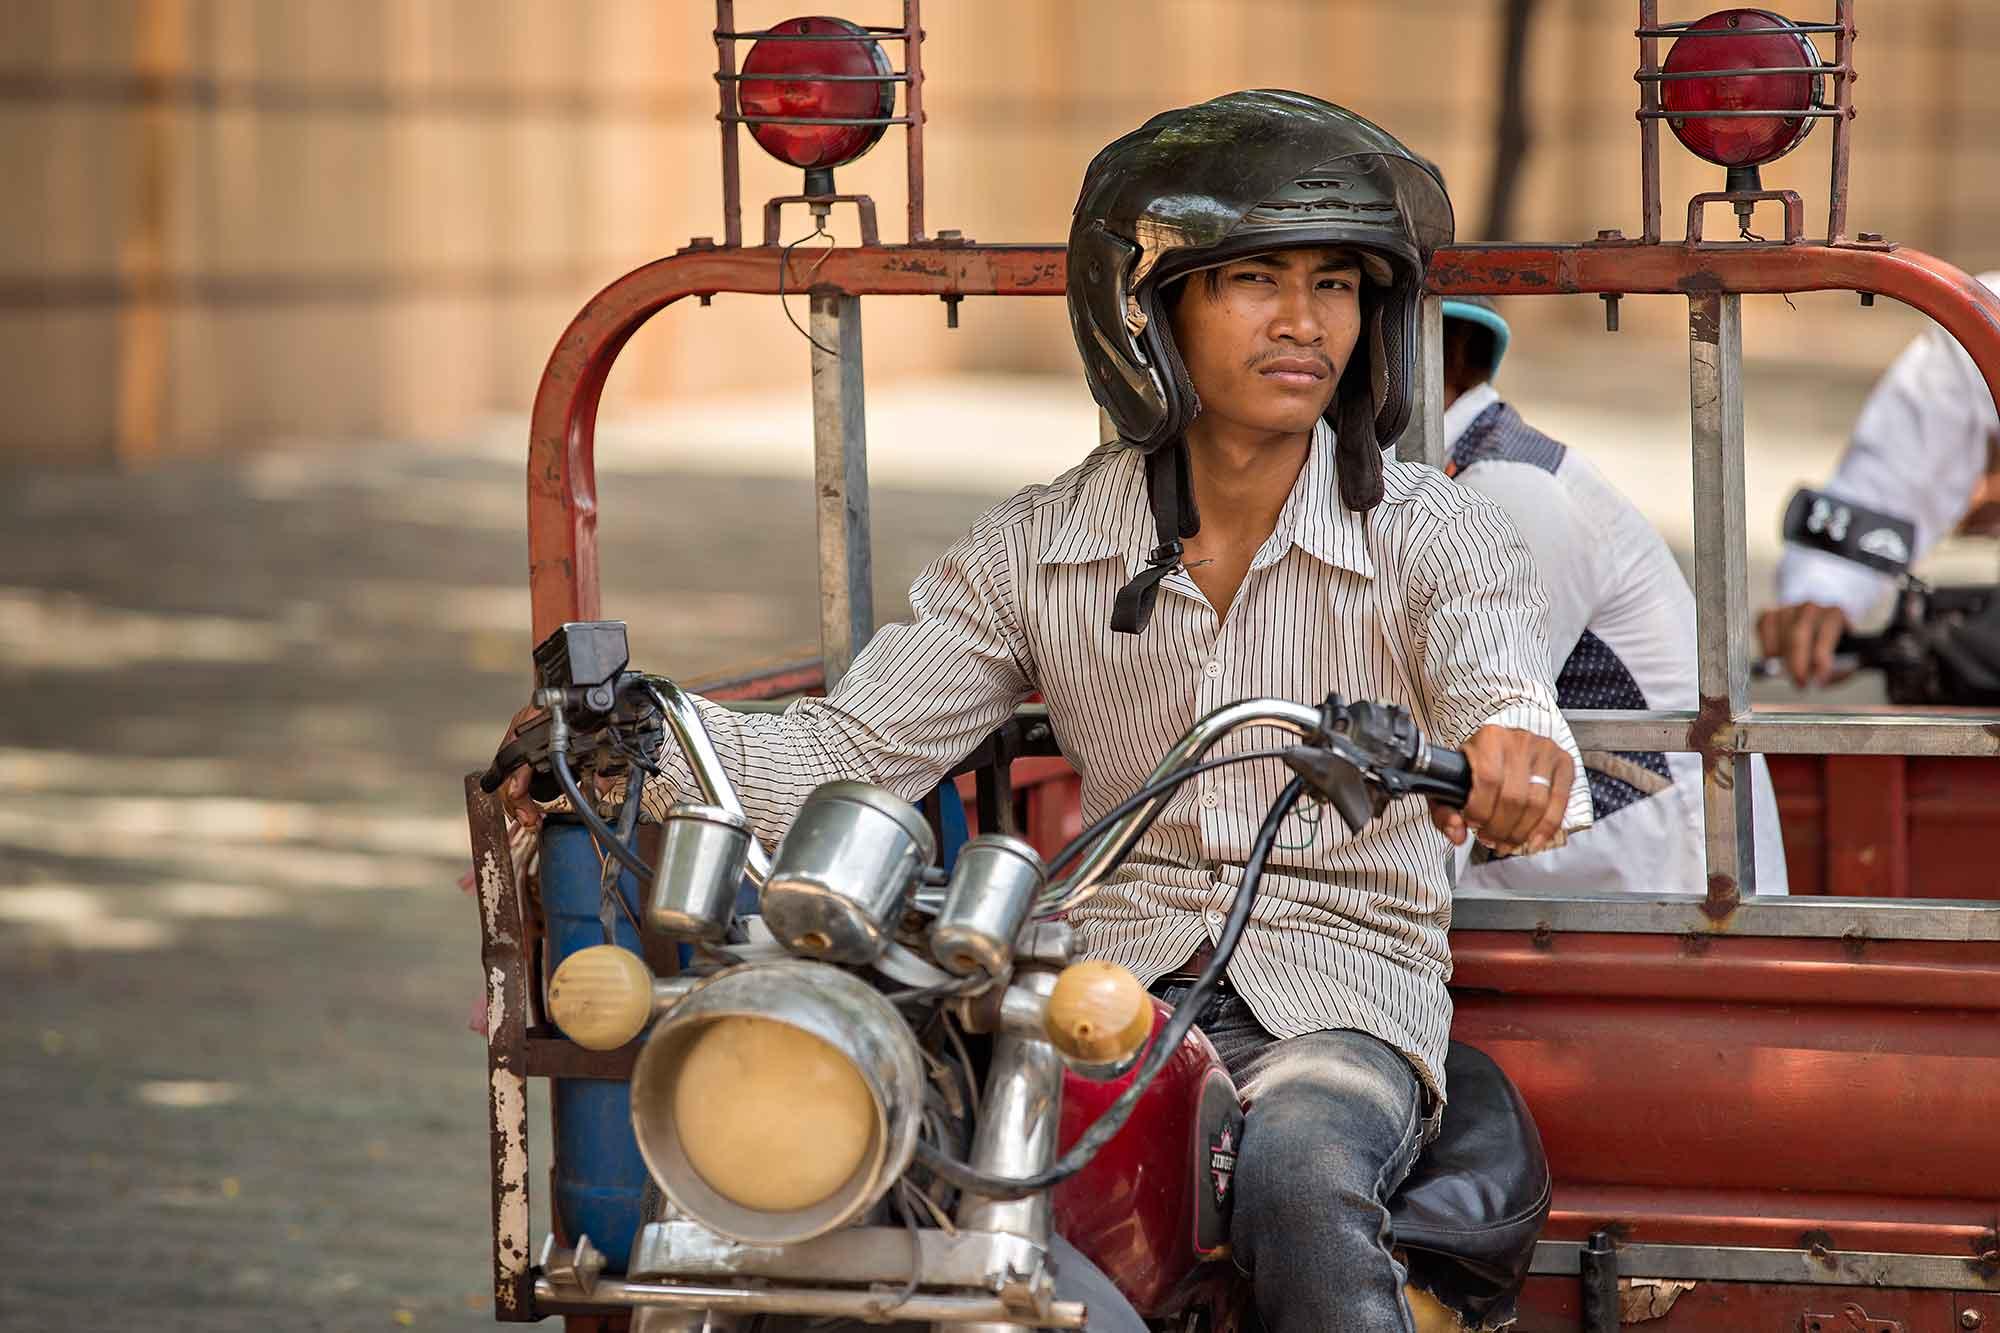 Man on a motorbike in Phnom Penh, Cambodia. © Ulli Maier & Nisa Maier